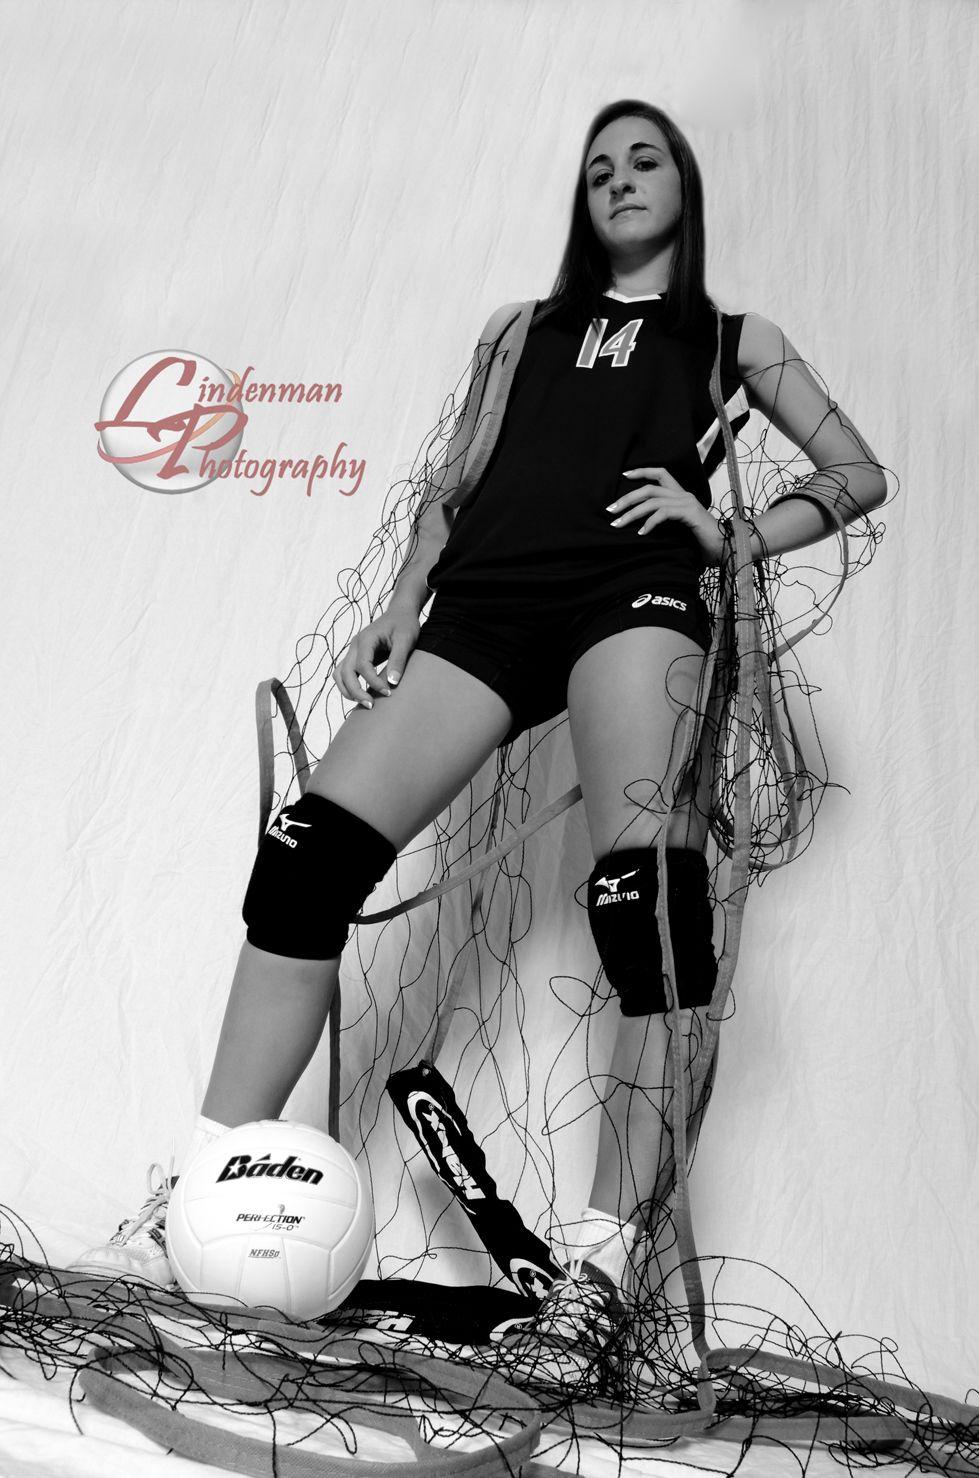 Lindenman Photography Volleyball Senior Pictures Volleyball Poses Volleyball Photography